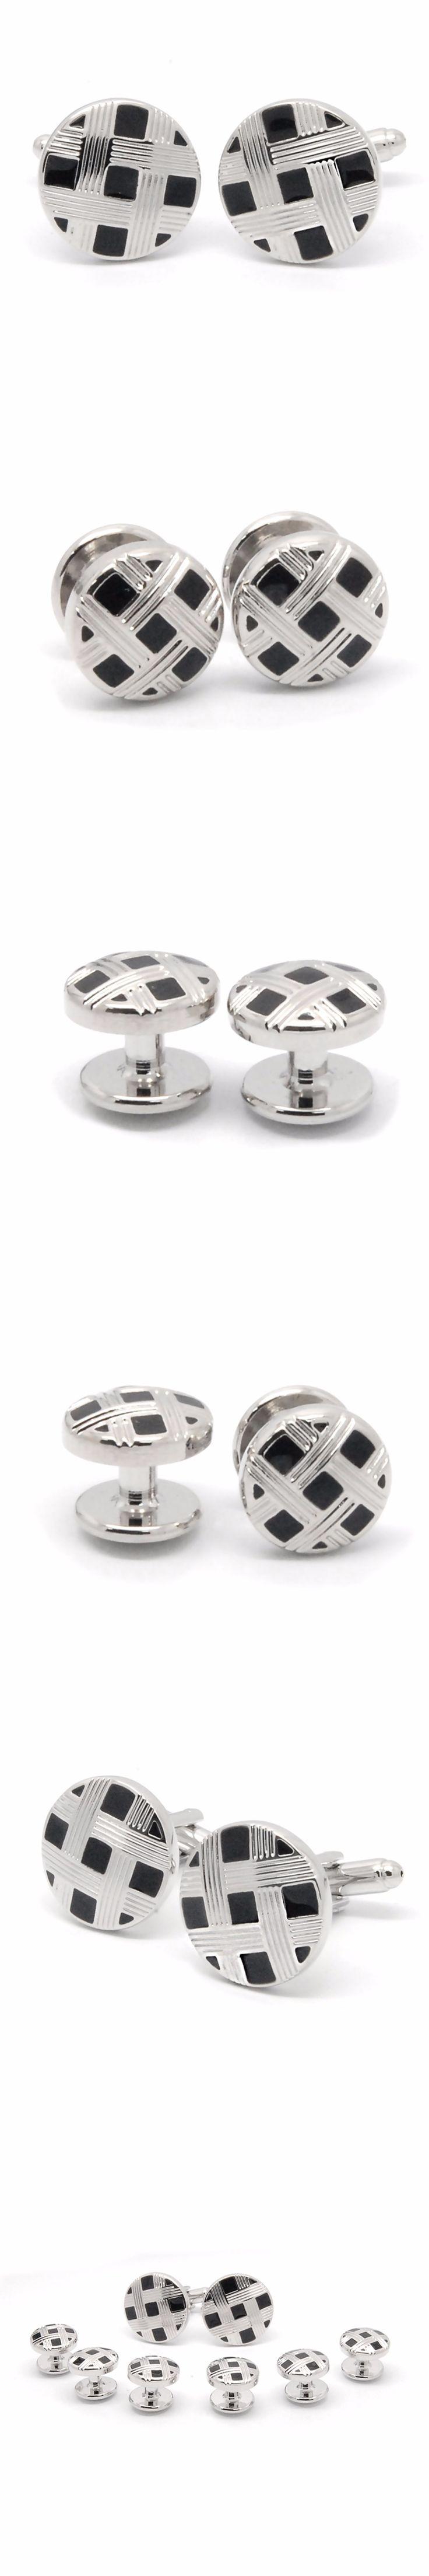 Silver And Black Cufflinks Set High Quality Copper Cufflink Men Shirt Cuff Links Wedding Groom Gift